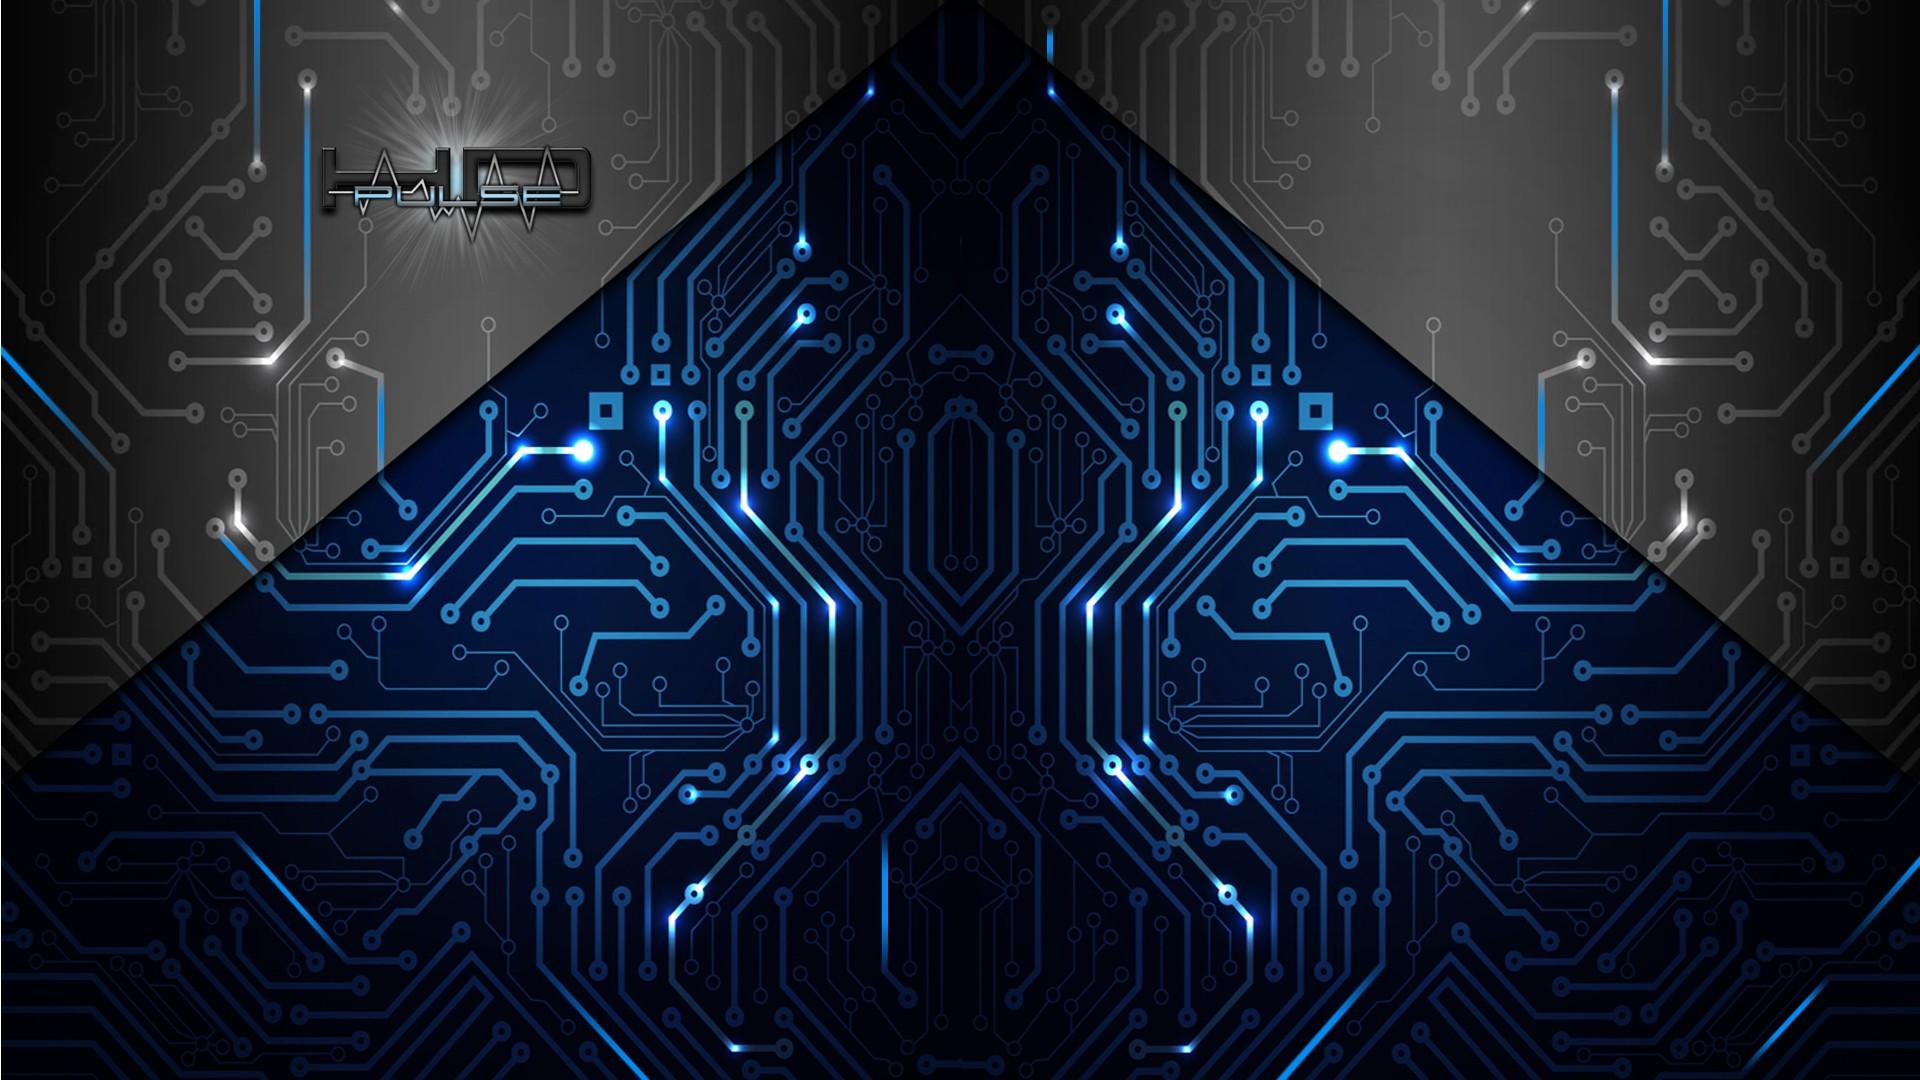 Abstract artistic electronics circuit board wallpaper 1920x1080 1920x1080